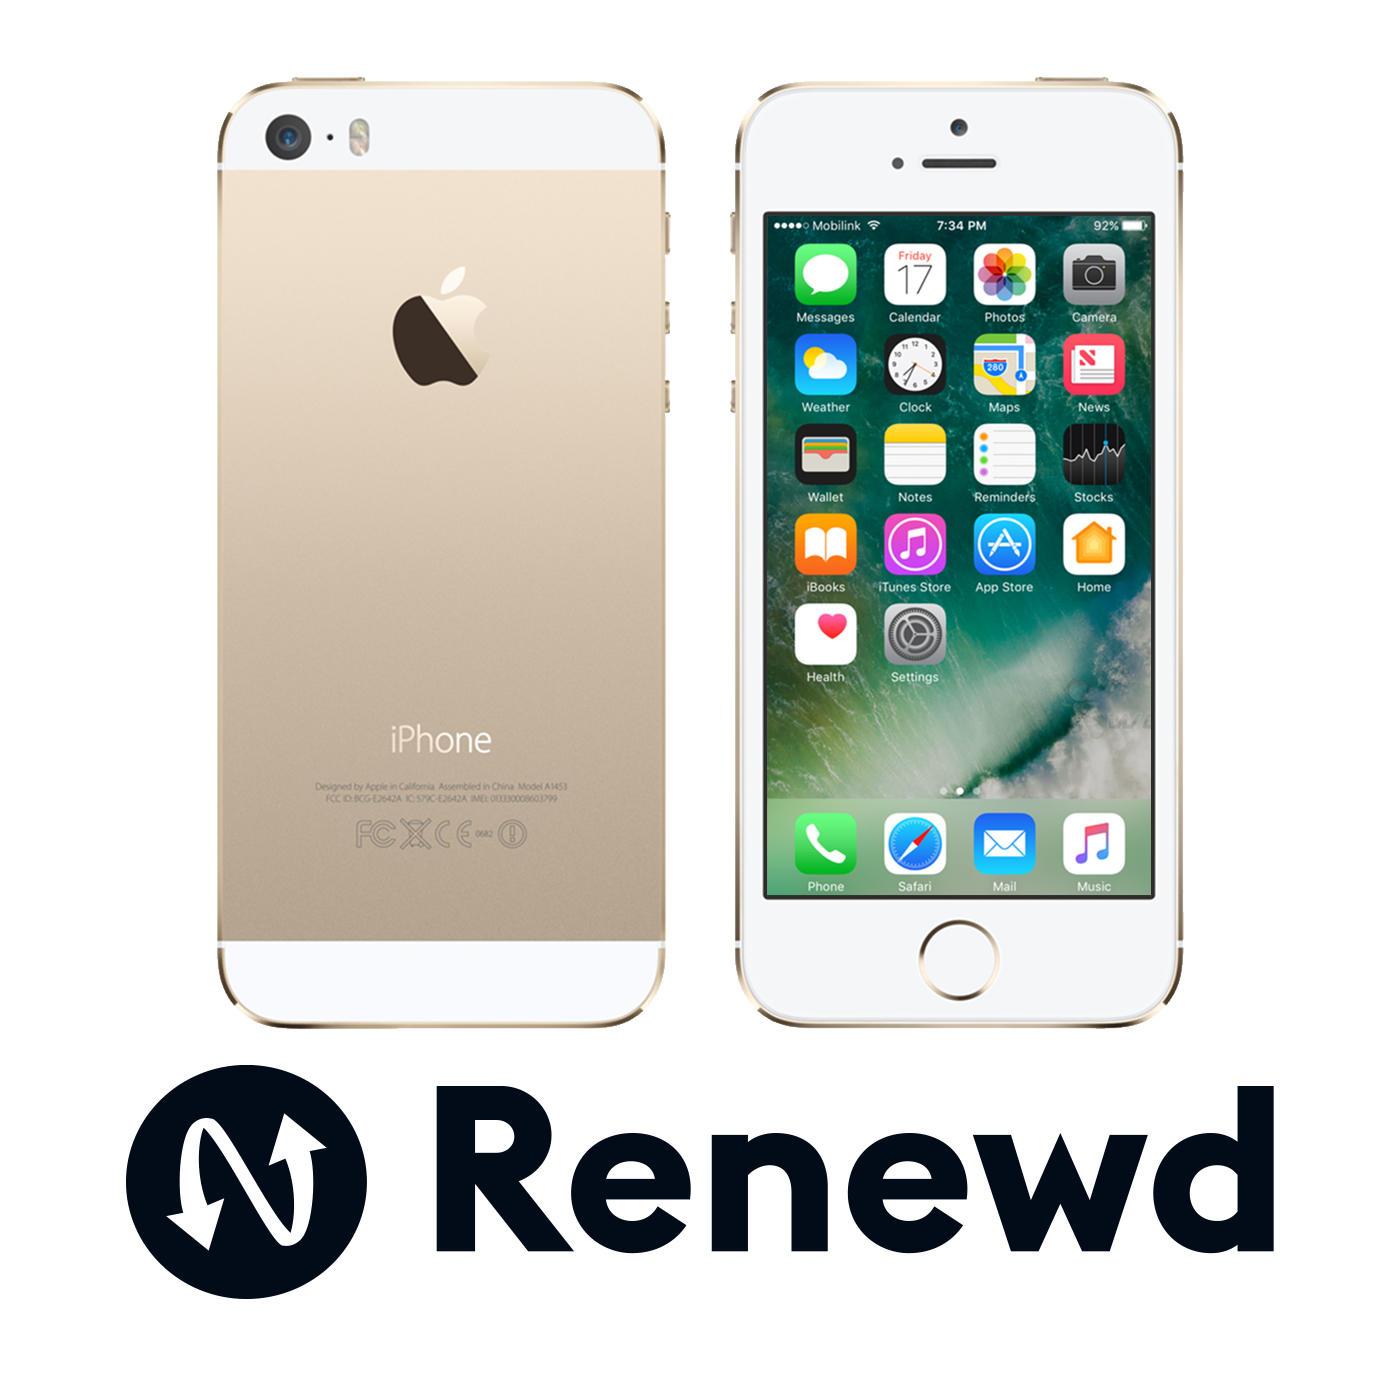 Renewd iPhone 5S 16GB Goud